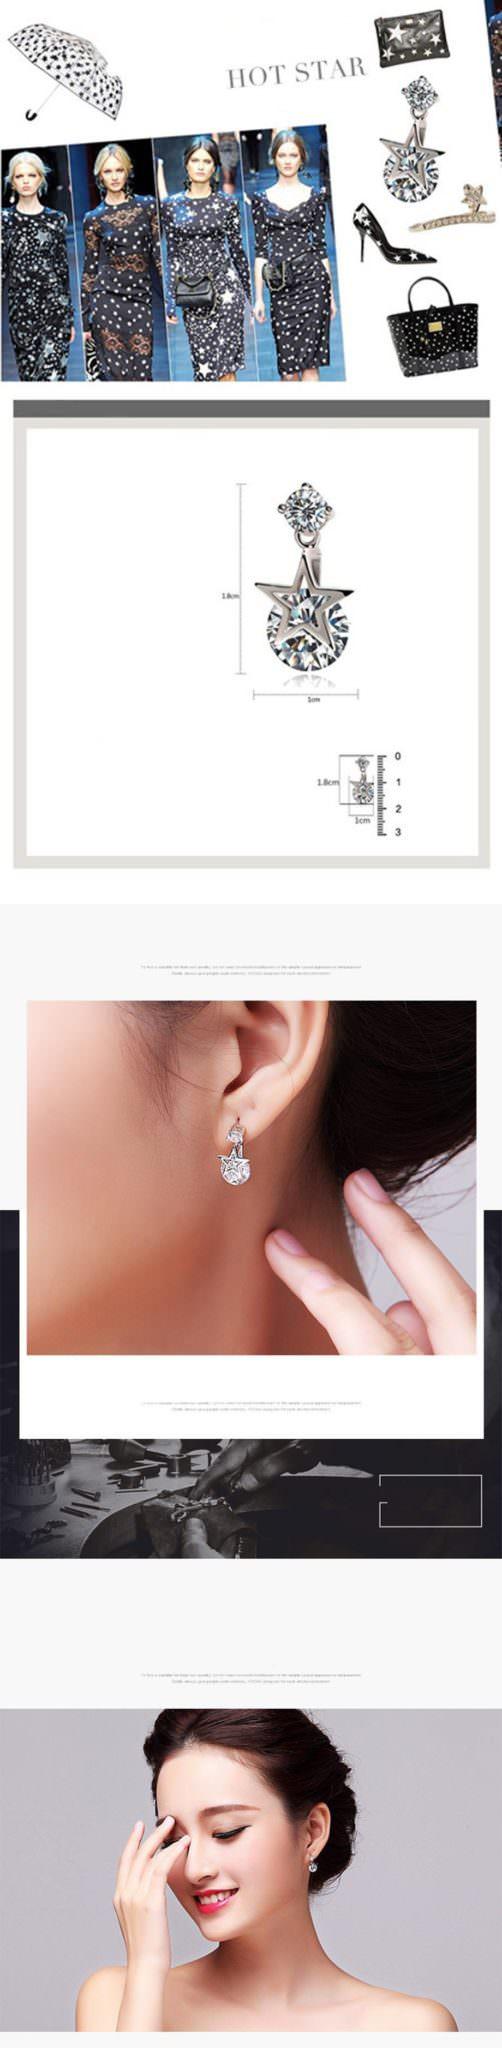 11578-cb200ed17100493056a4e7899cc1488a 2016 Ms Crystal Pentagram Cubic Zirconia Fashion Jewelry Earrings